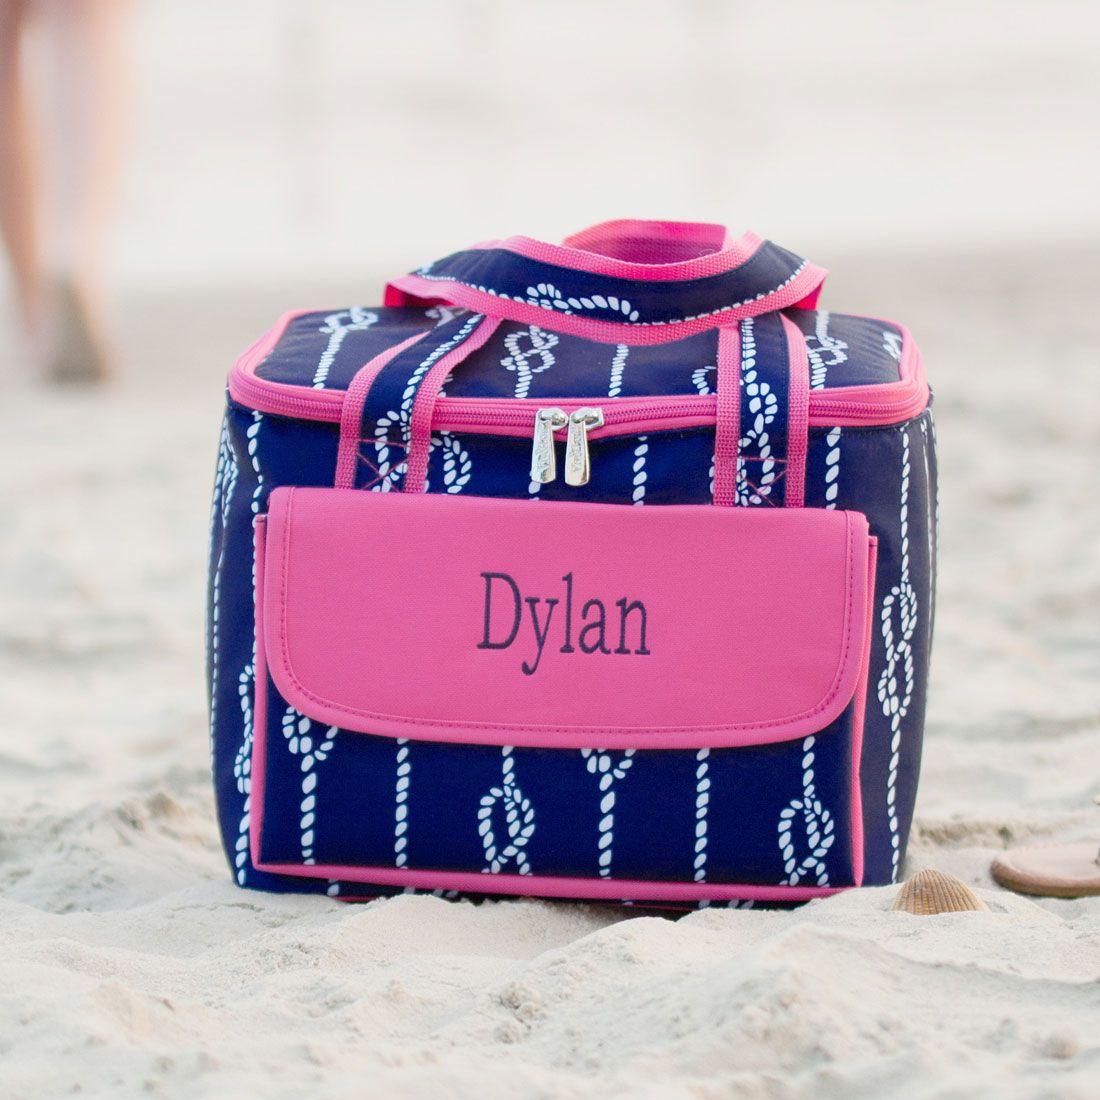 High Tide Monogrammed Cosmetic Bag Cooler tote bag